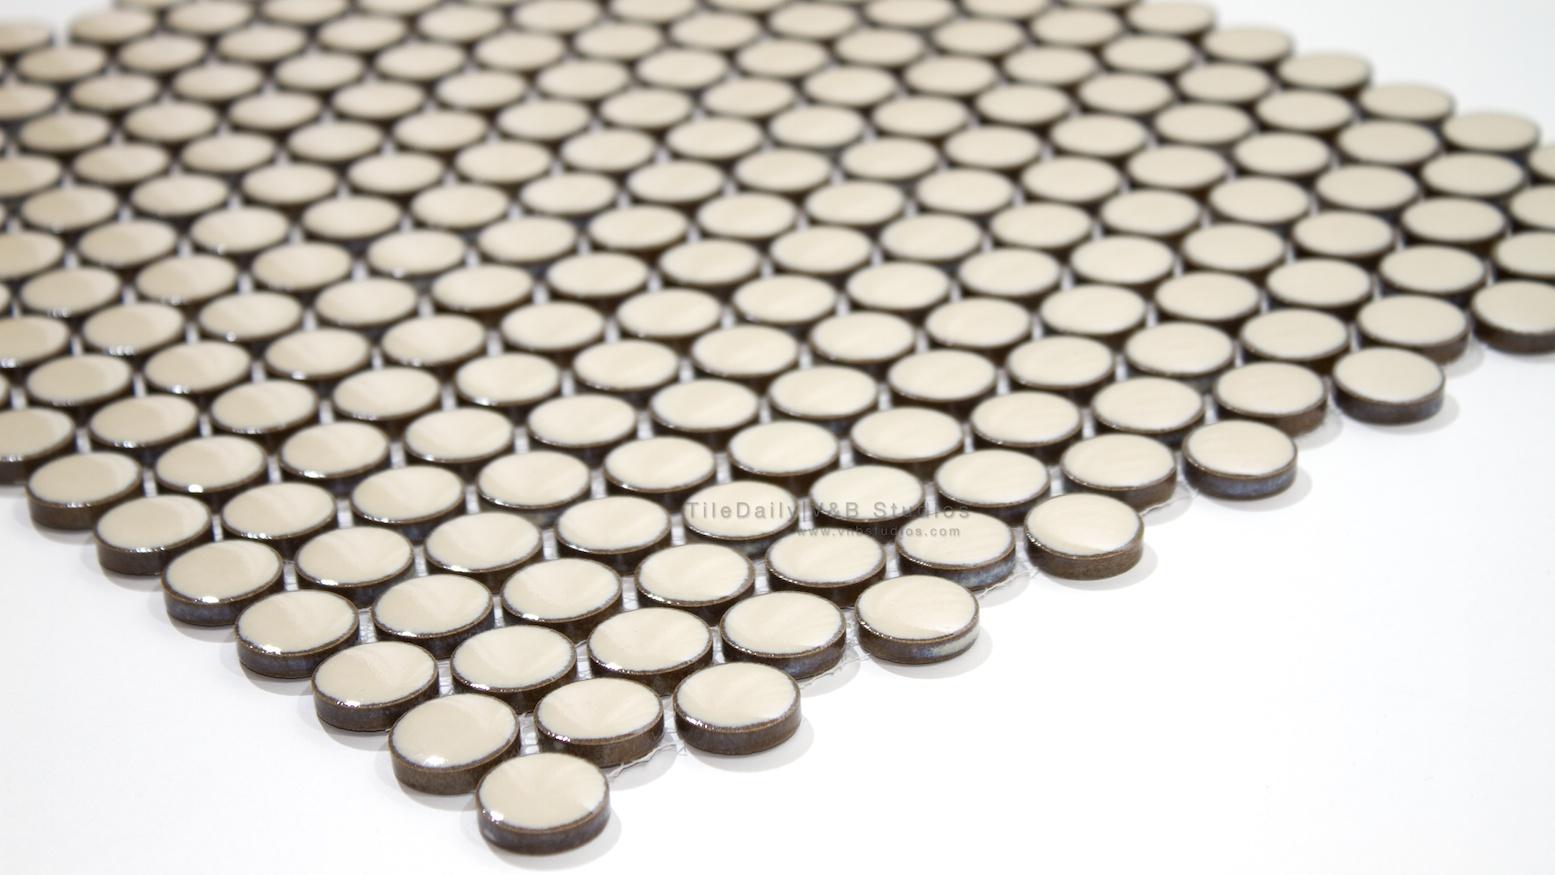 Rustic Penny Round Porcelain Mosaics Tiledaily